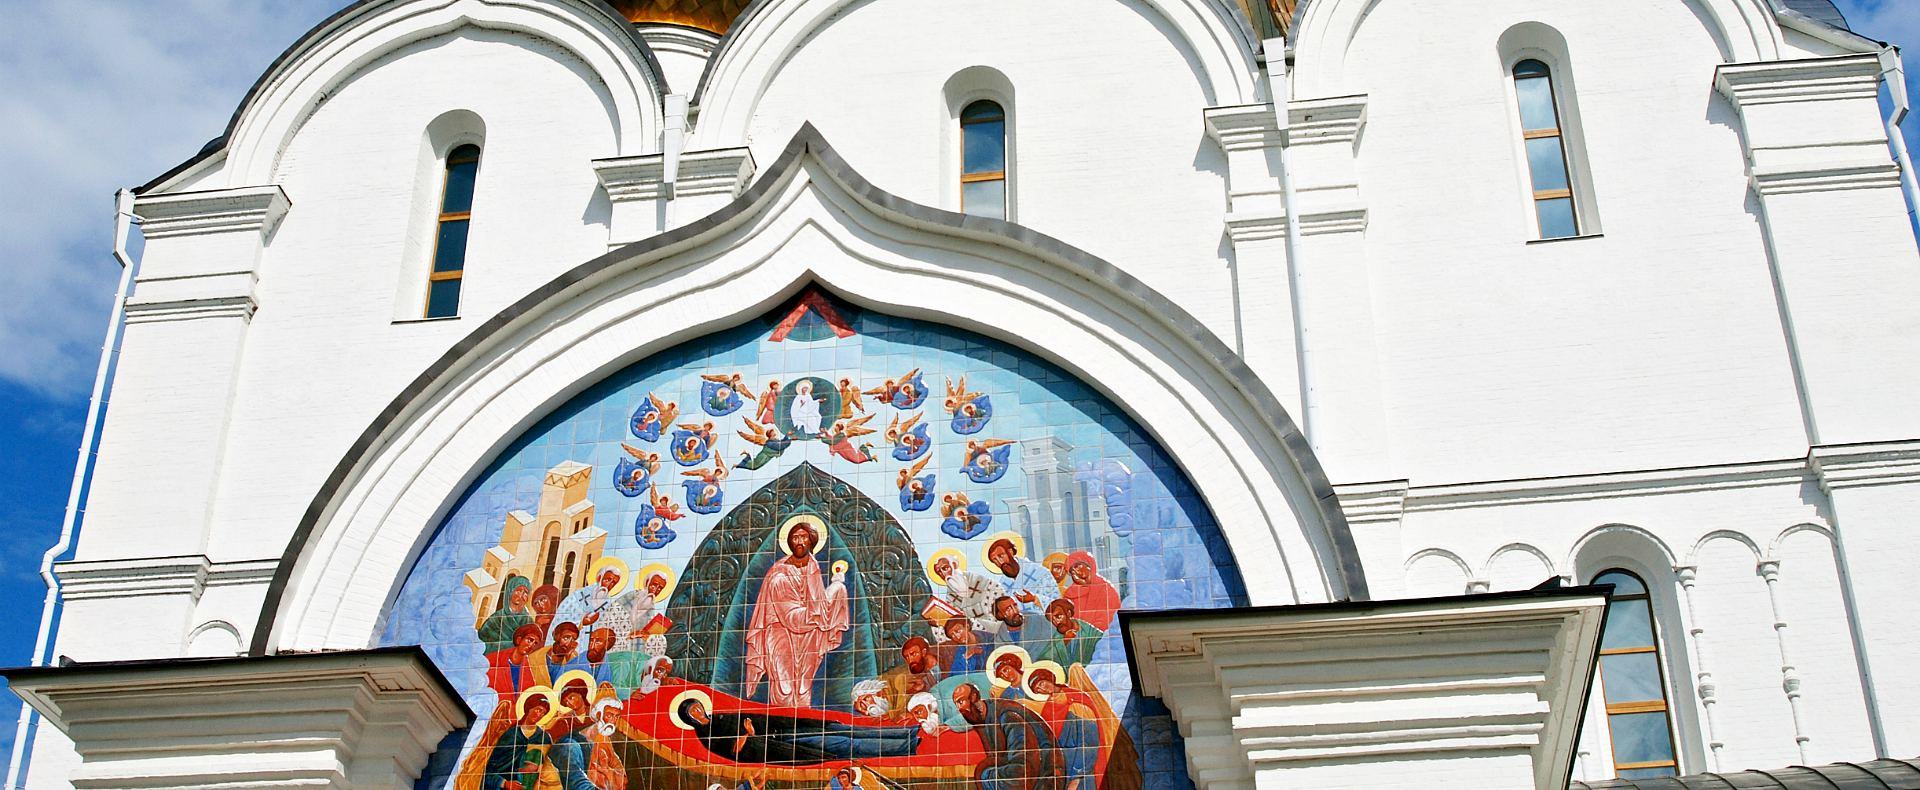 Yaroslavl, Russia